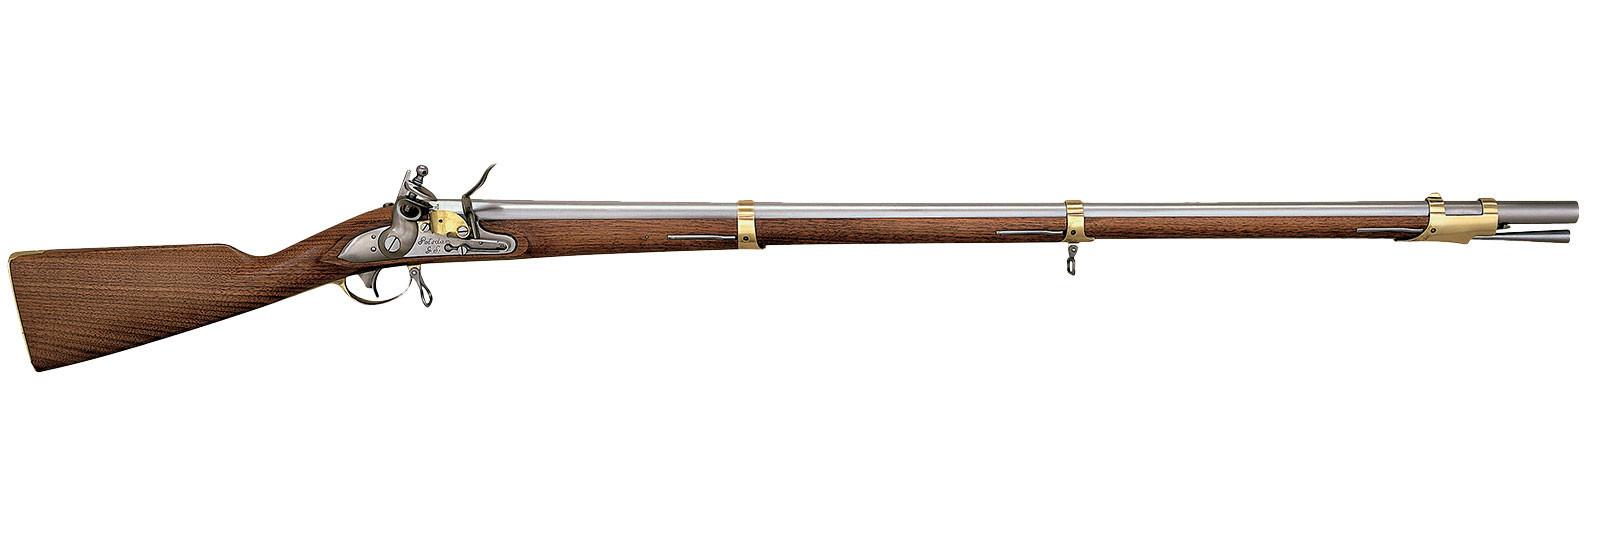 1809 Prussian